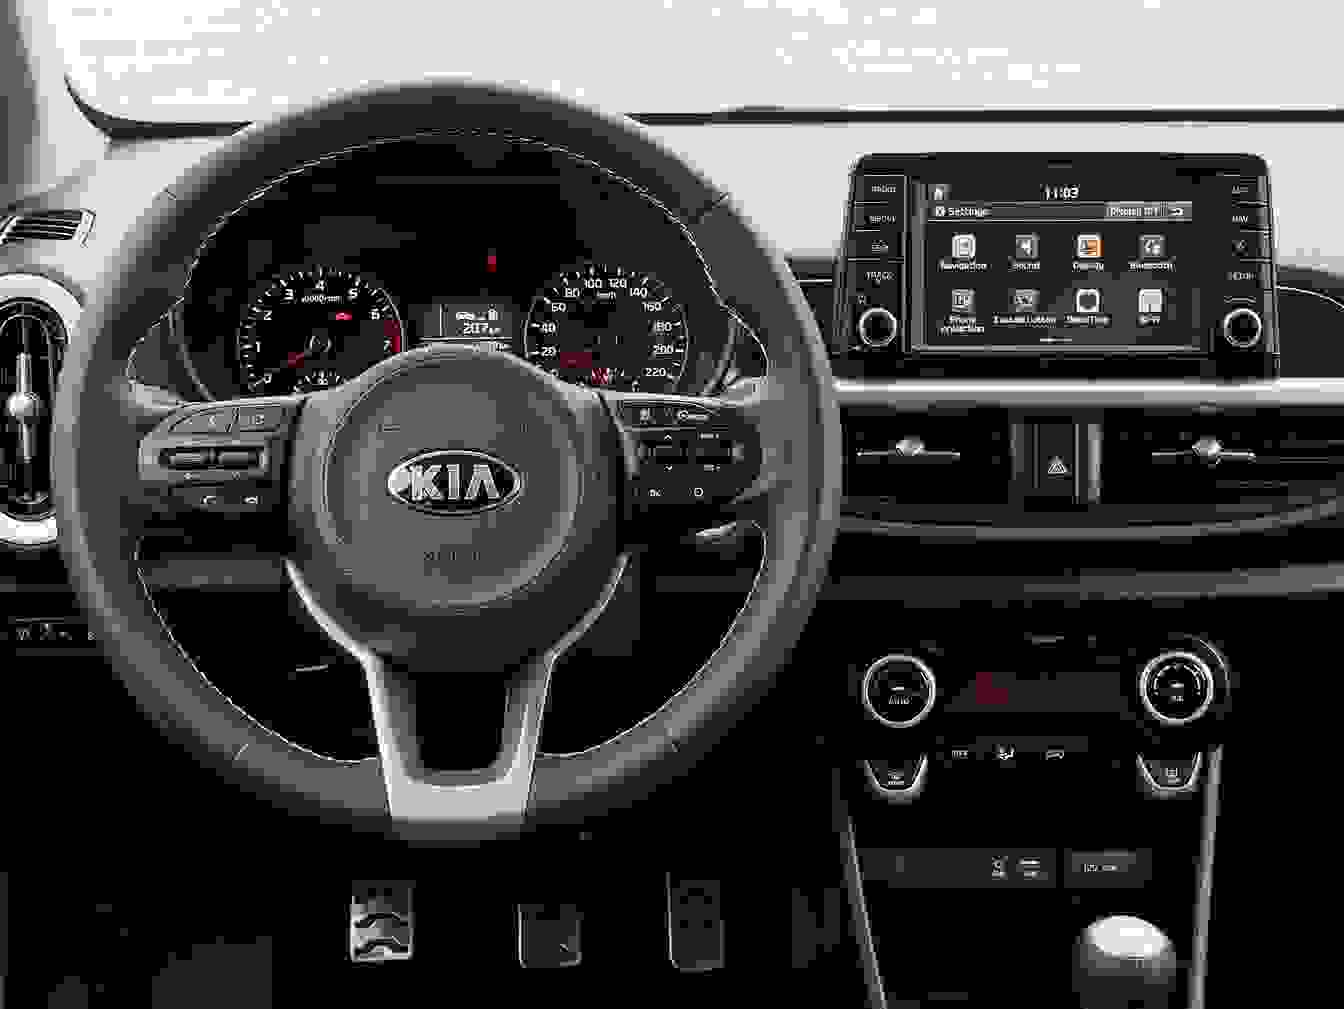 Kia Picanto 2018 Interior Foererplads Ac Anlaeg Tft Skaerm Rat